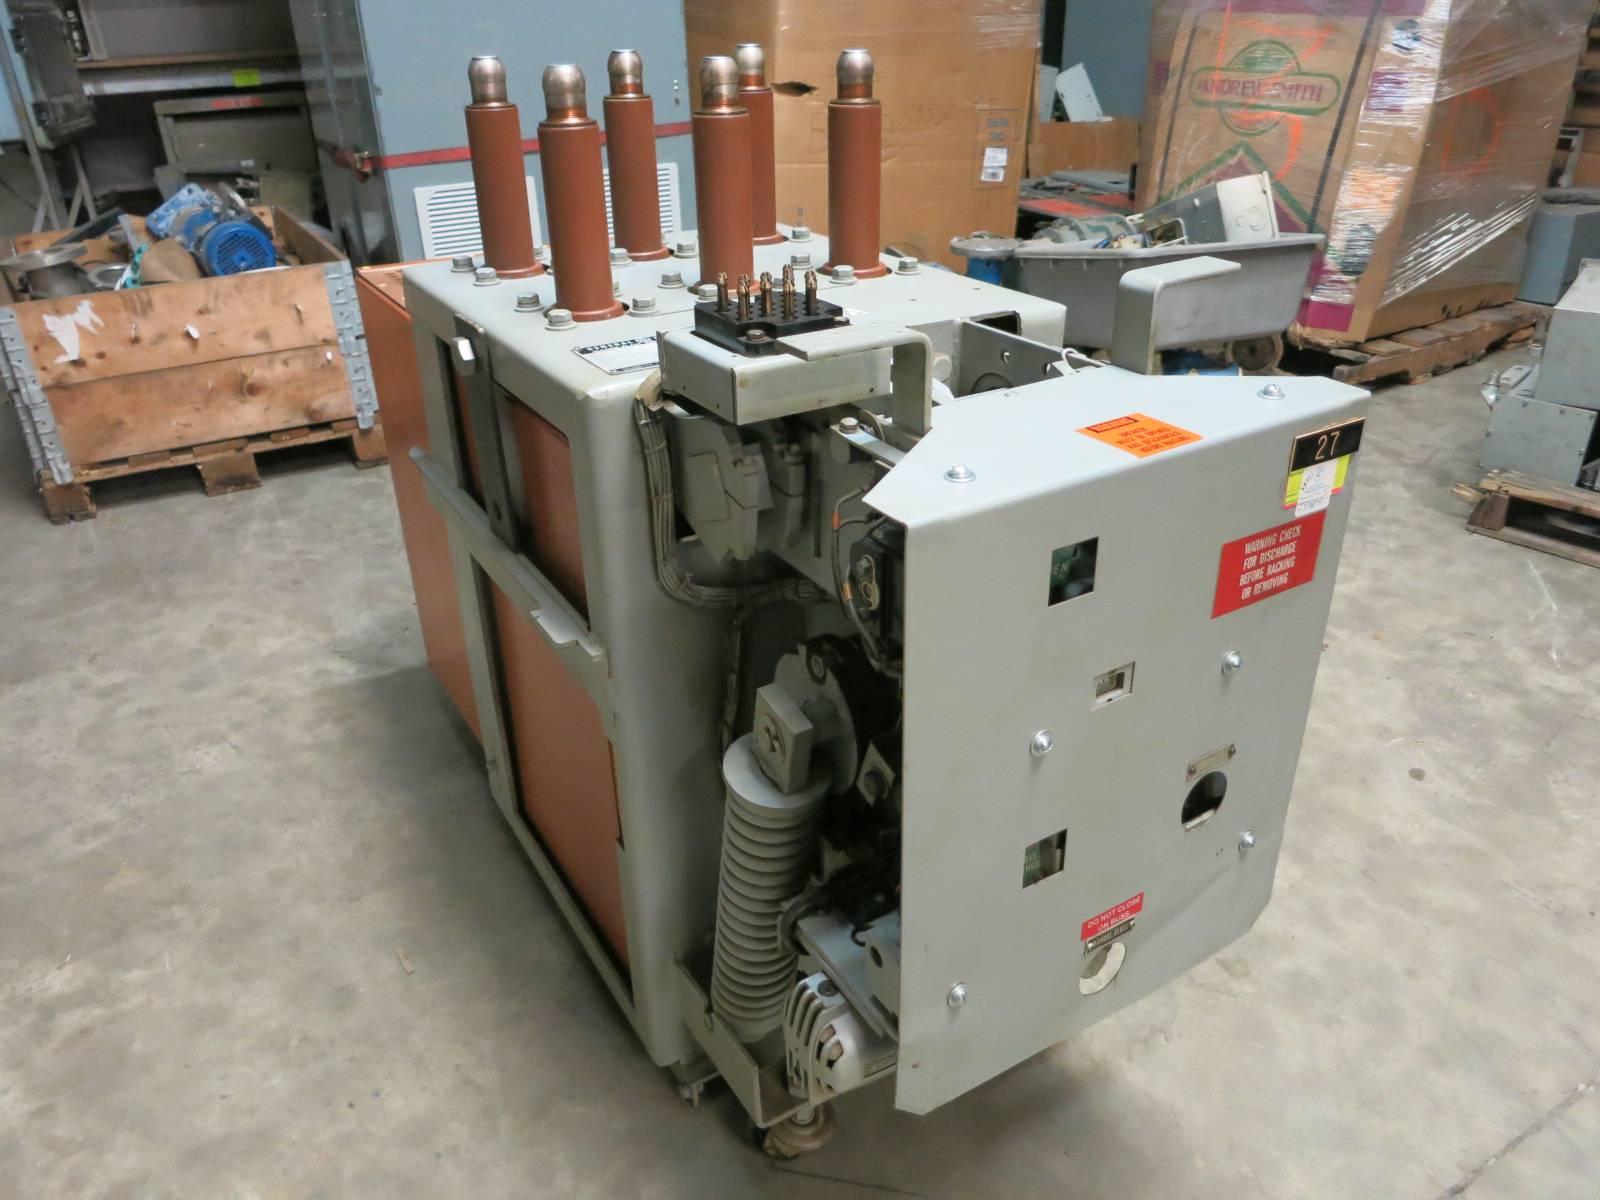 vacuum retrofit ge magne blast am 13 8 750 5h 1200a vvc breaker  vacuum retrofit ge magne blast am 13 8 750 5h 1200a vvc breaker general electric (pm2909 1) river city industrial